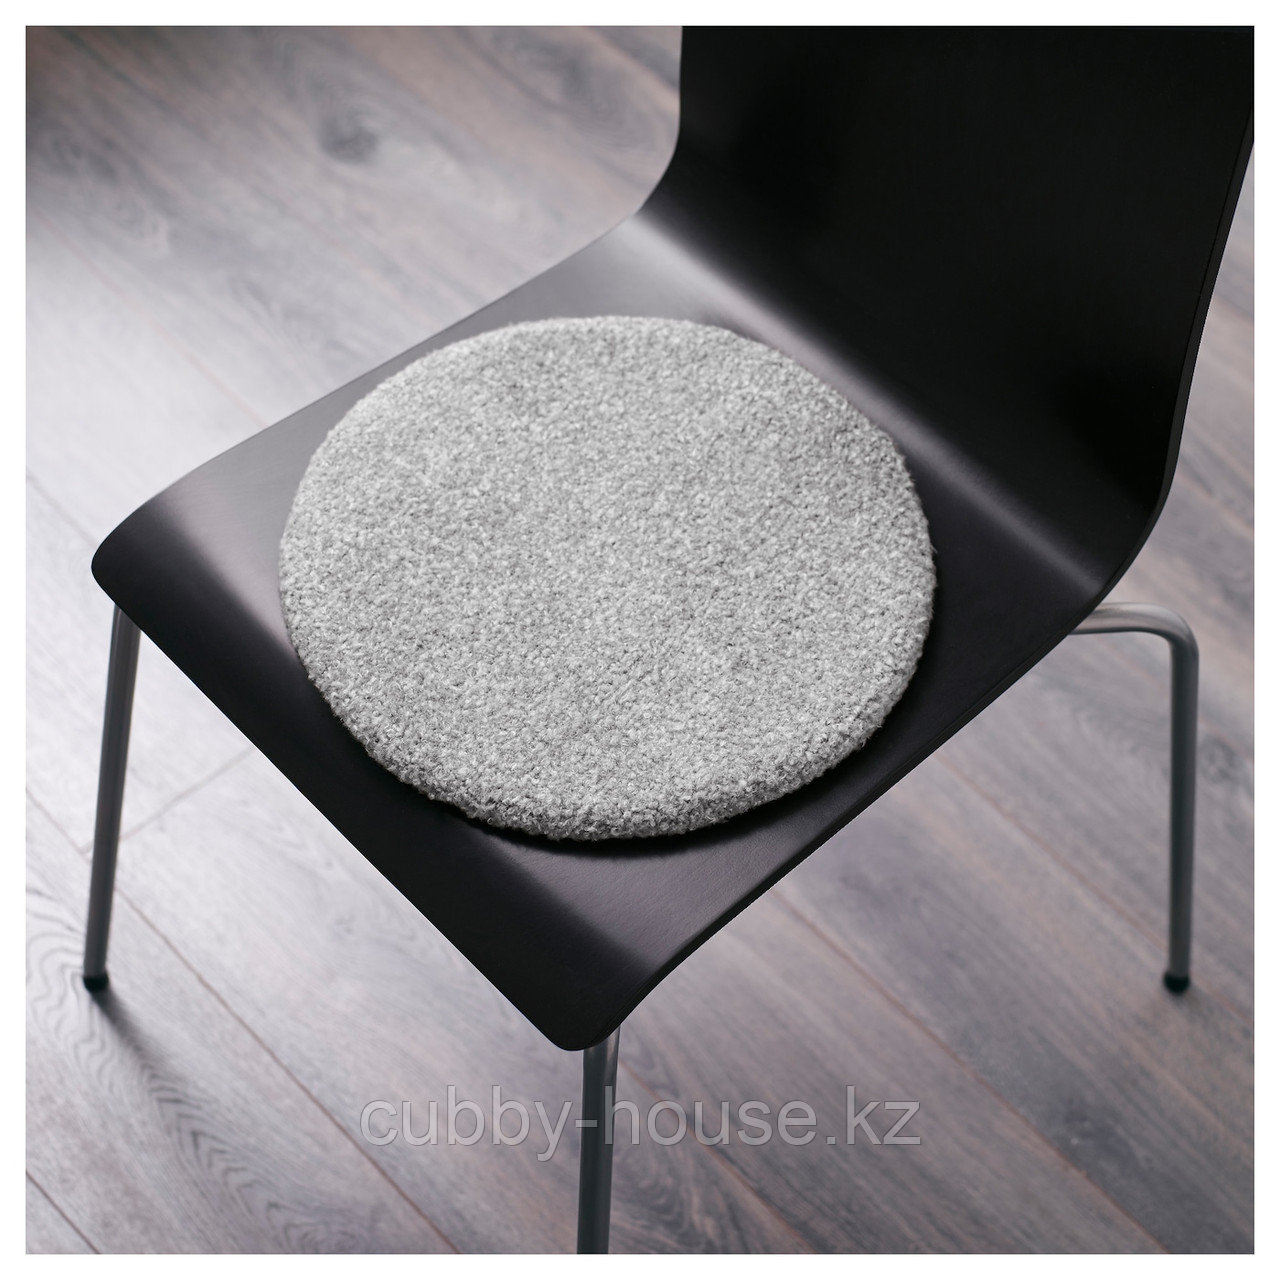 БЕРТИЛЬ Подушка на стул, серый, 33 см - фото 4